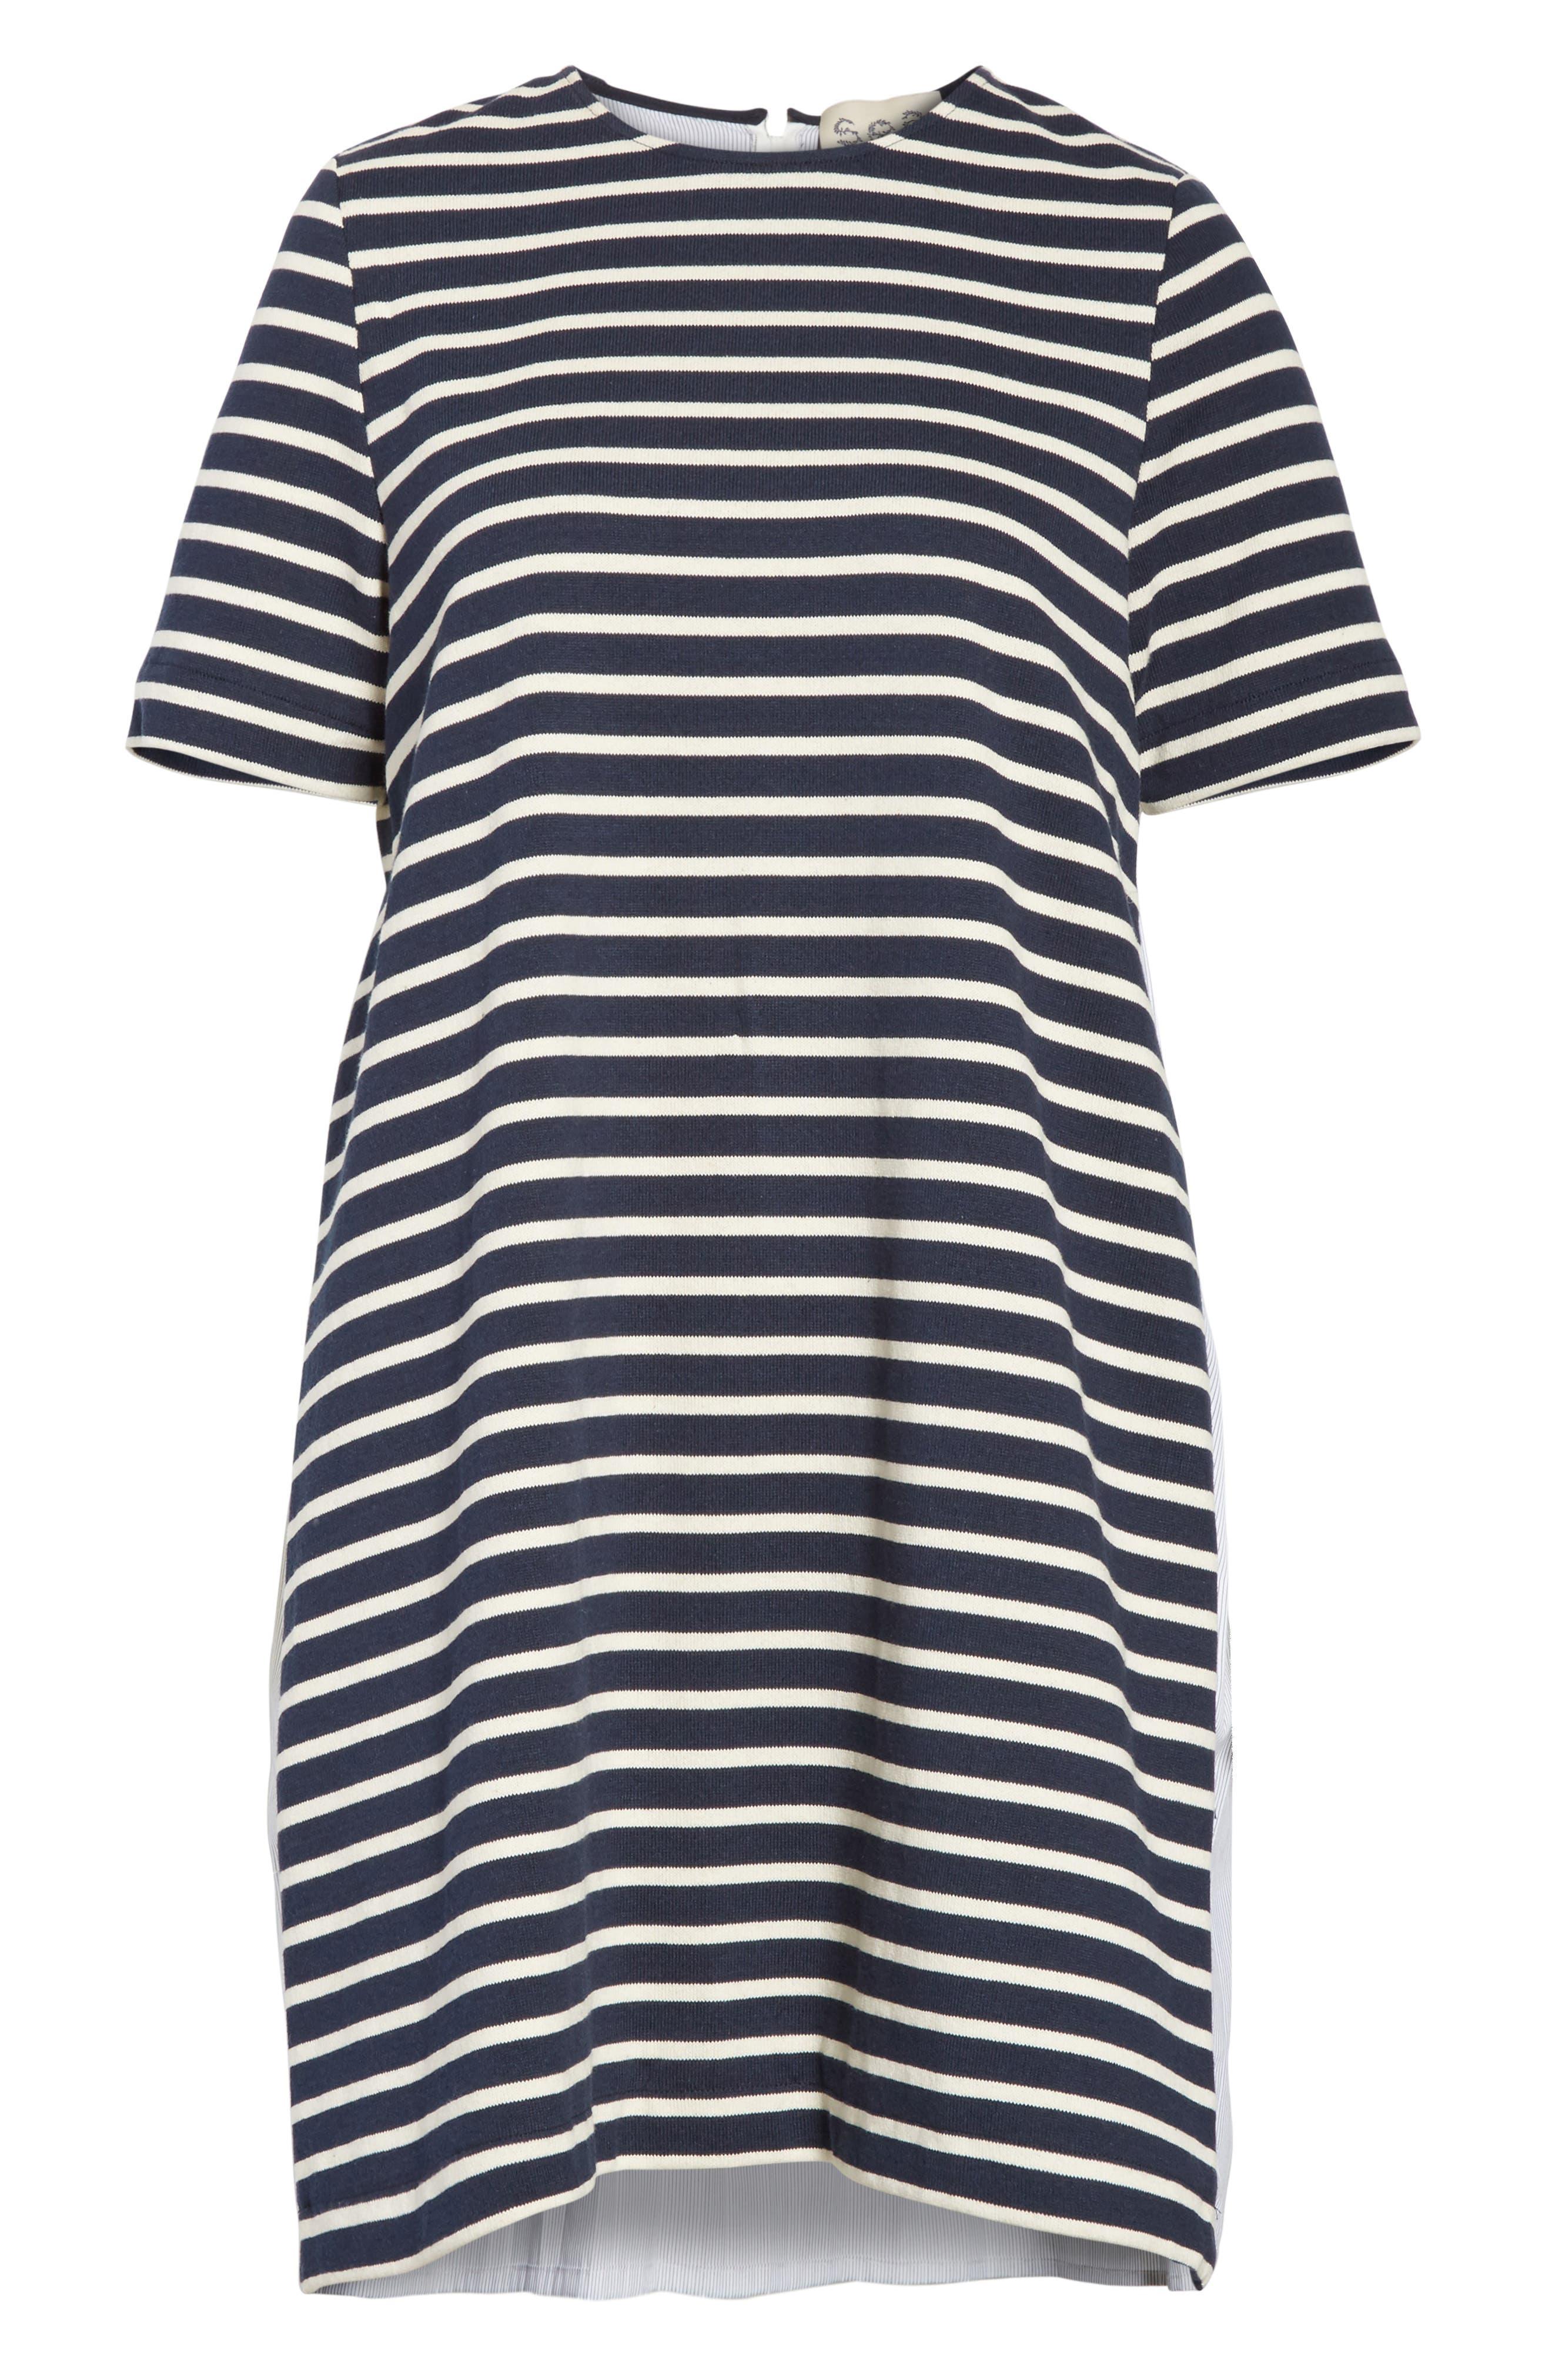 Latch Back Tunic Dress,                             Alternate thumbnail 6, color,                             Navy/ Cream Multi